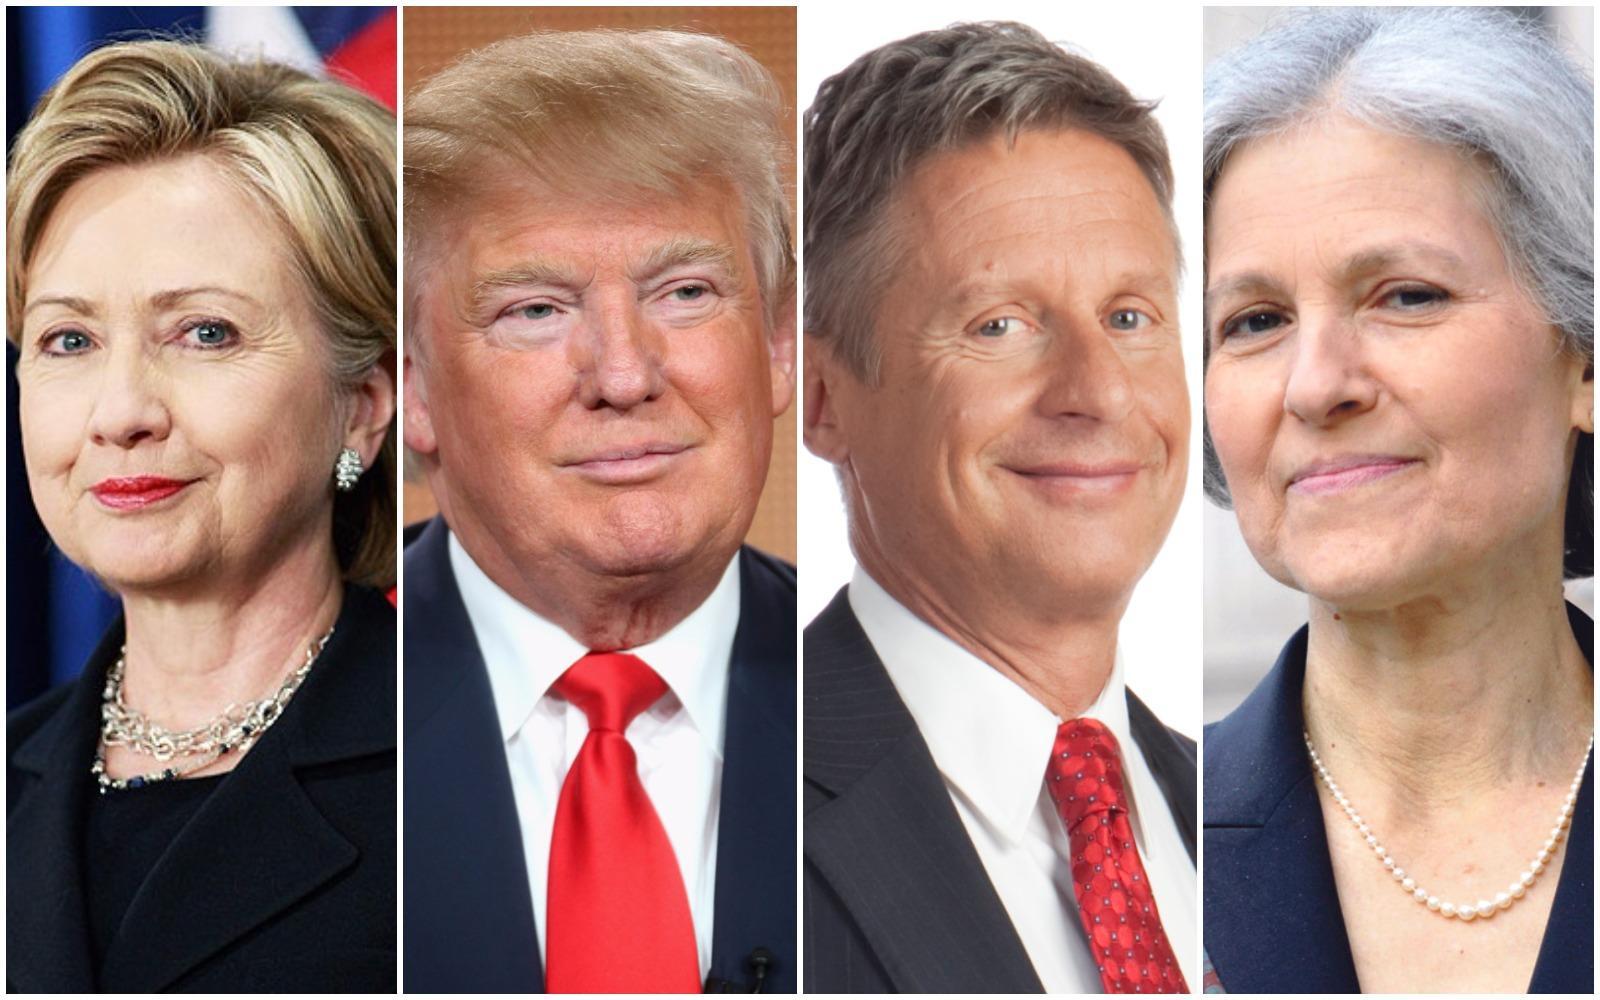 candidatepoliciespicture